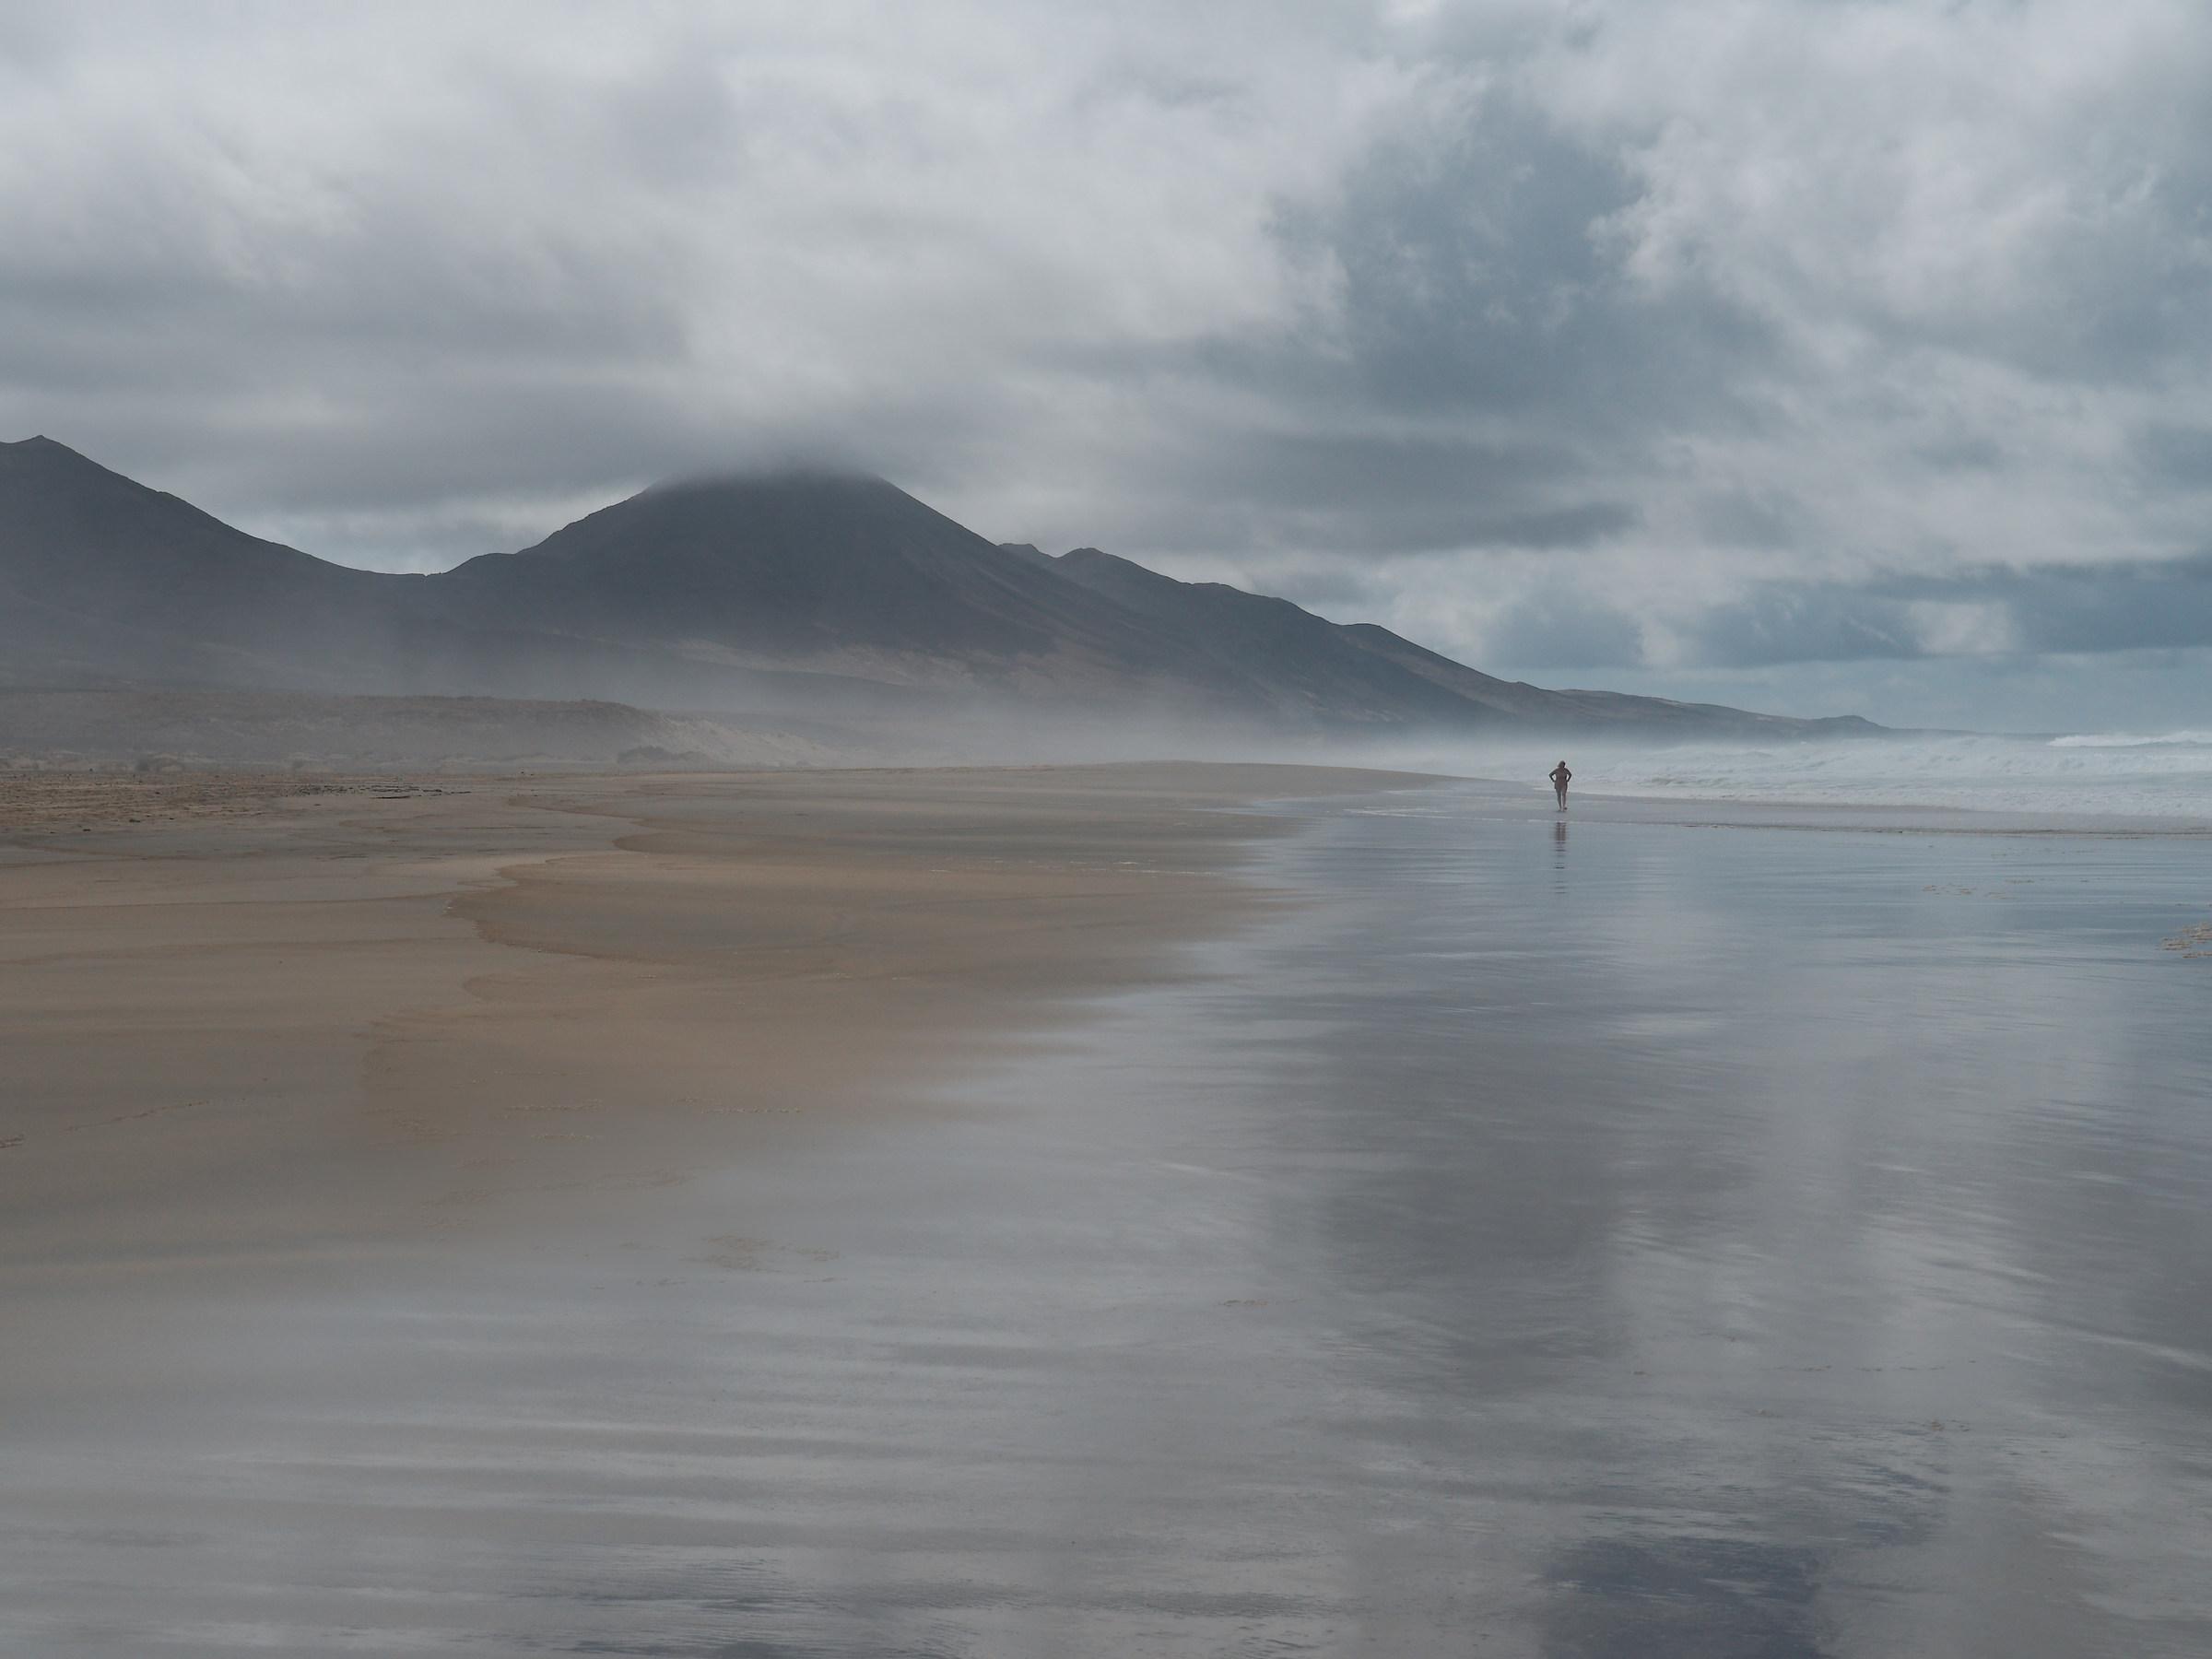 Spain, Fuerteventura March 2018...